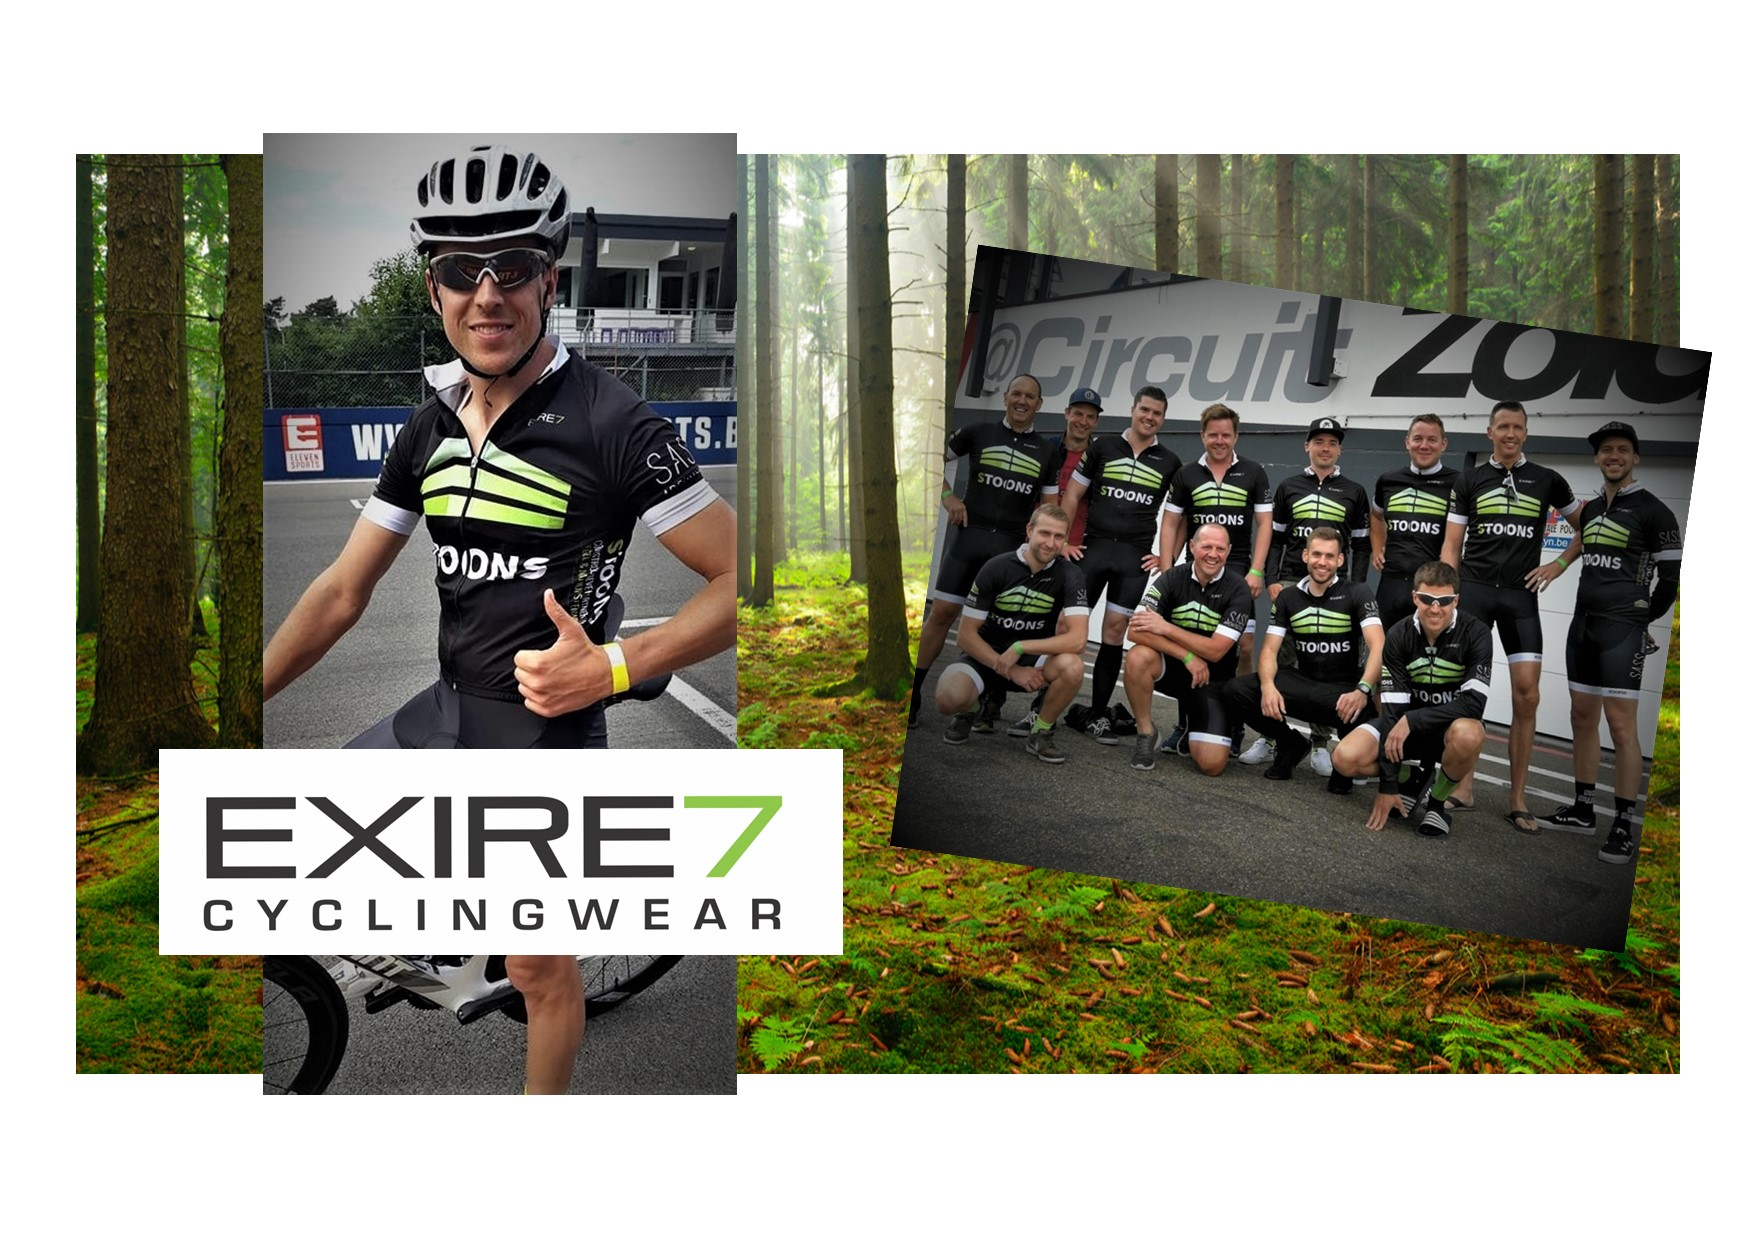 EXIRE7 - cyclingwear - Sass Stoons